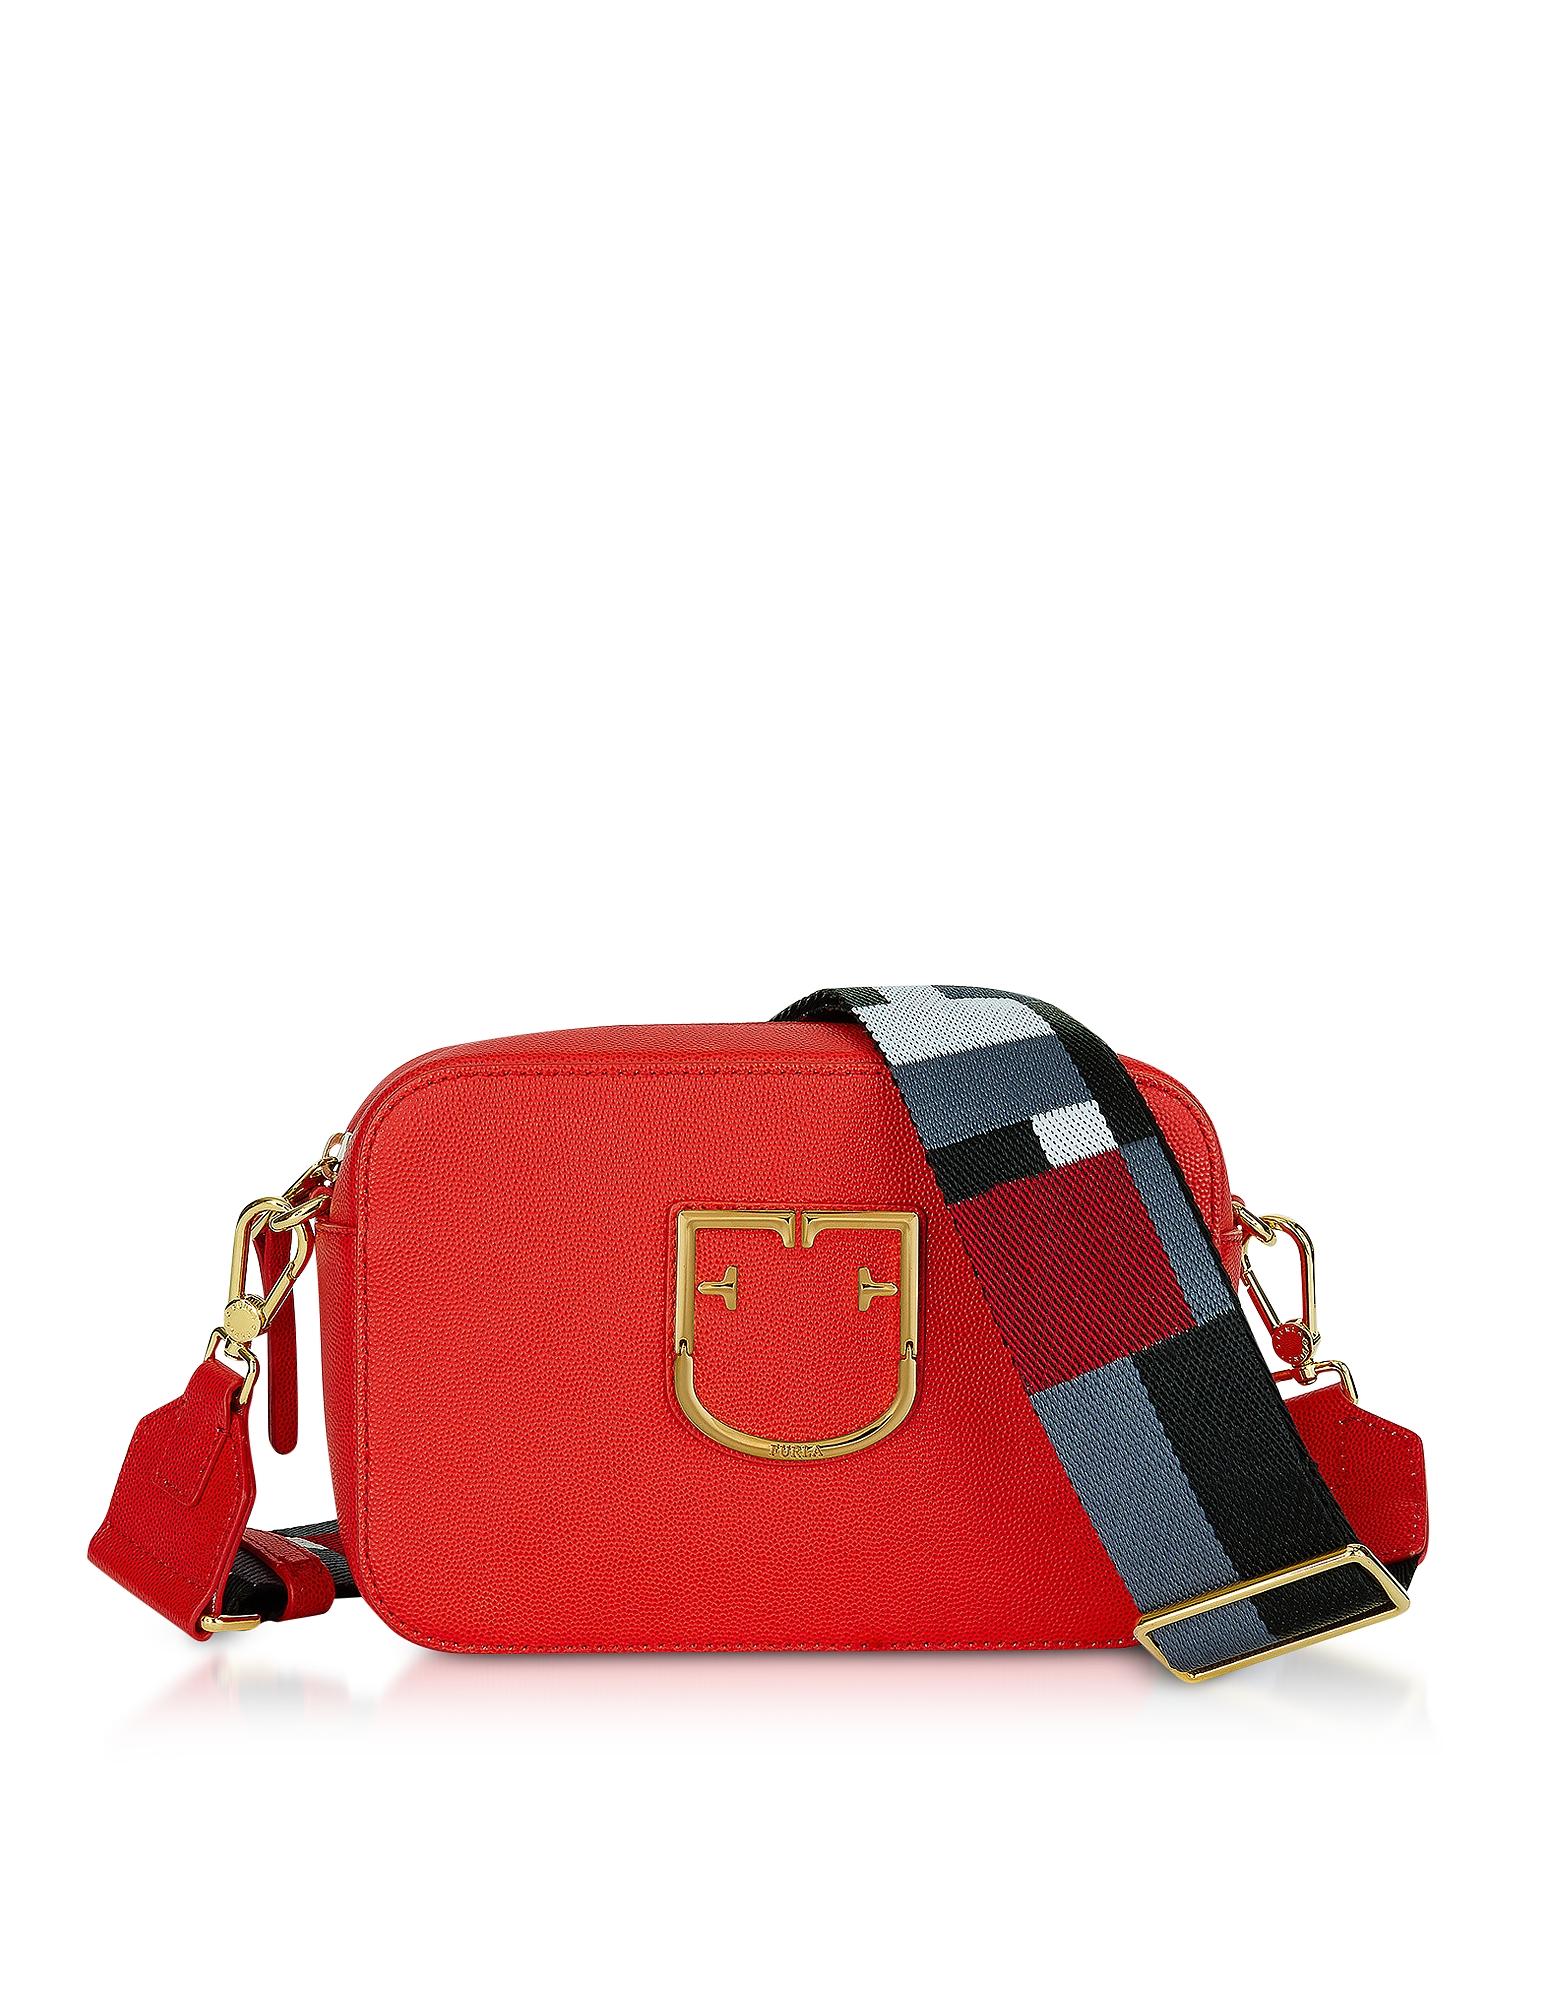 Furla Handbags, Brava Mini Crossbody Bag